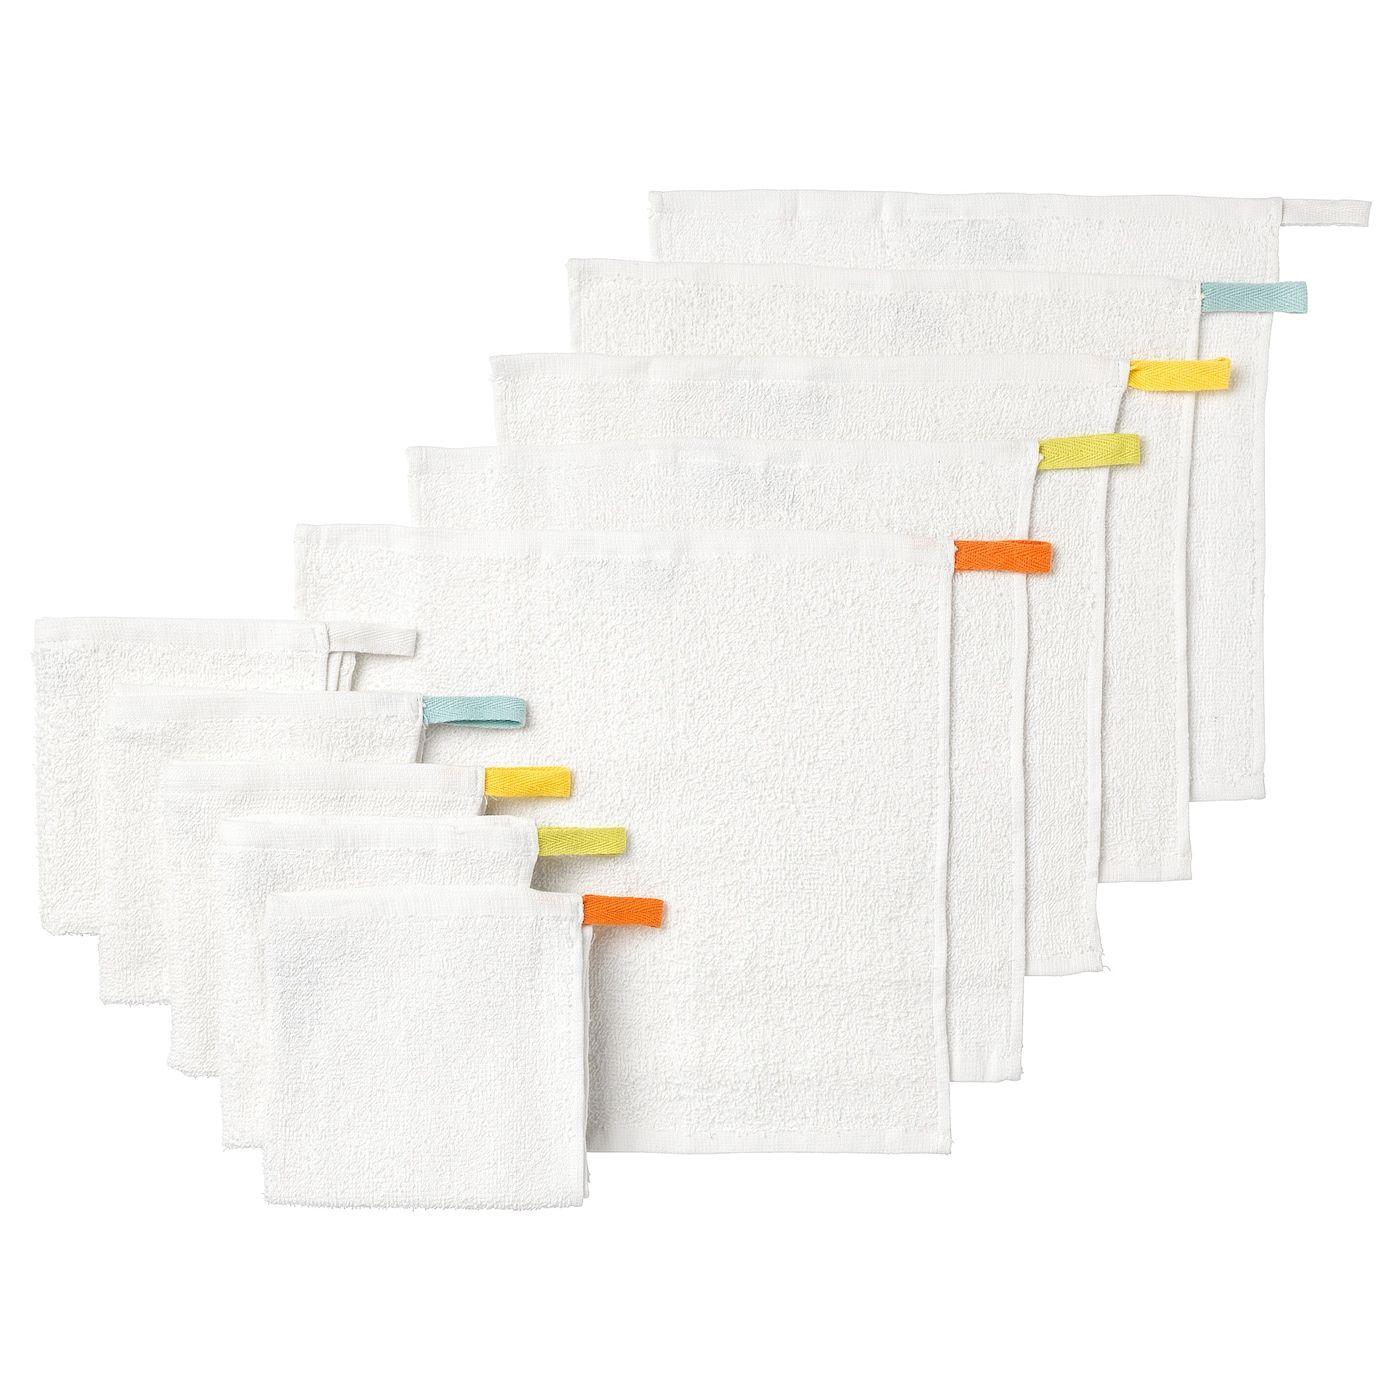 Krama Petite Serviette Blanc 30x30 Cm Ikea Serviettes